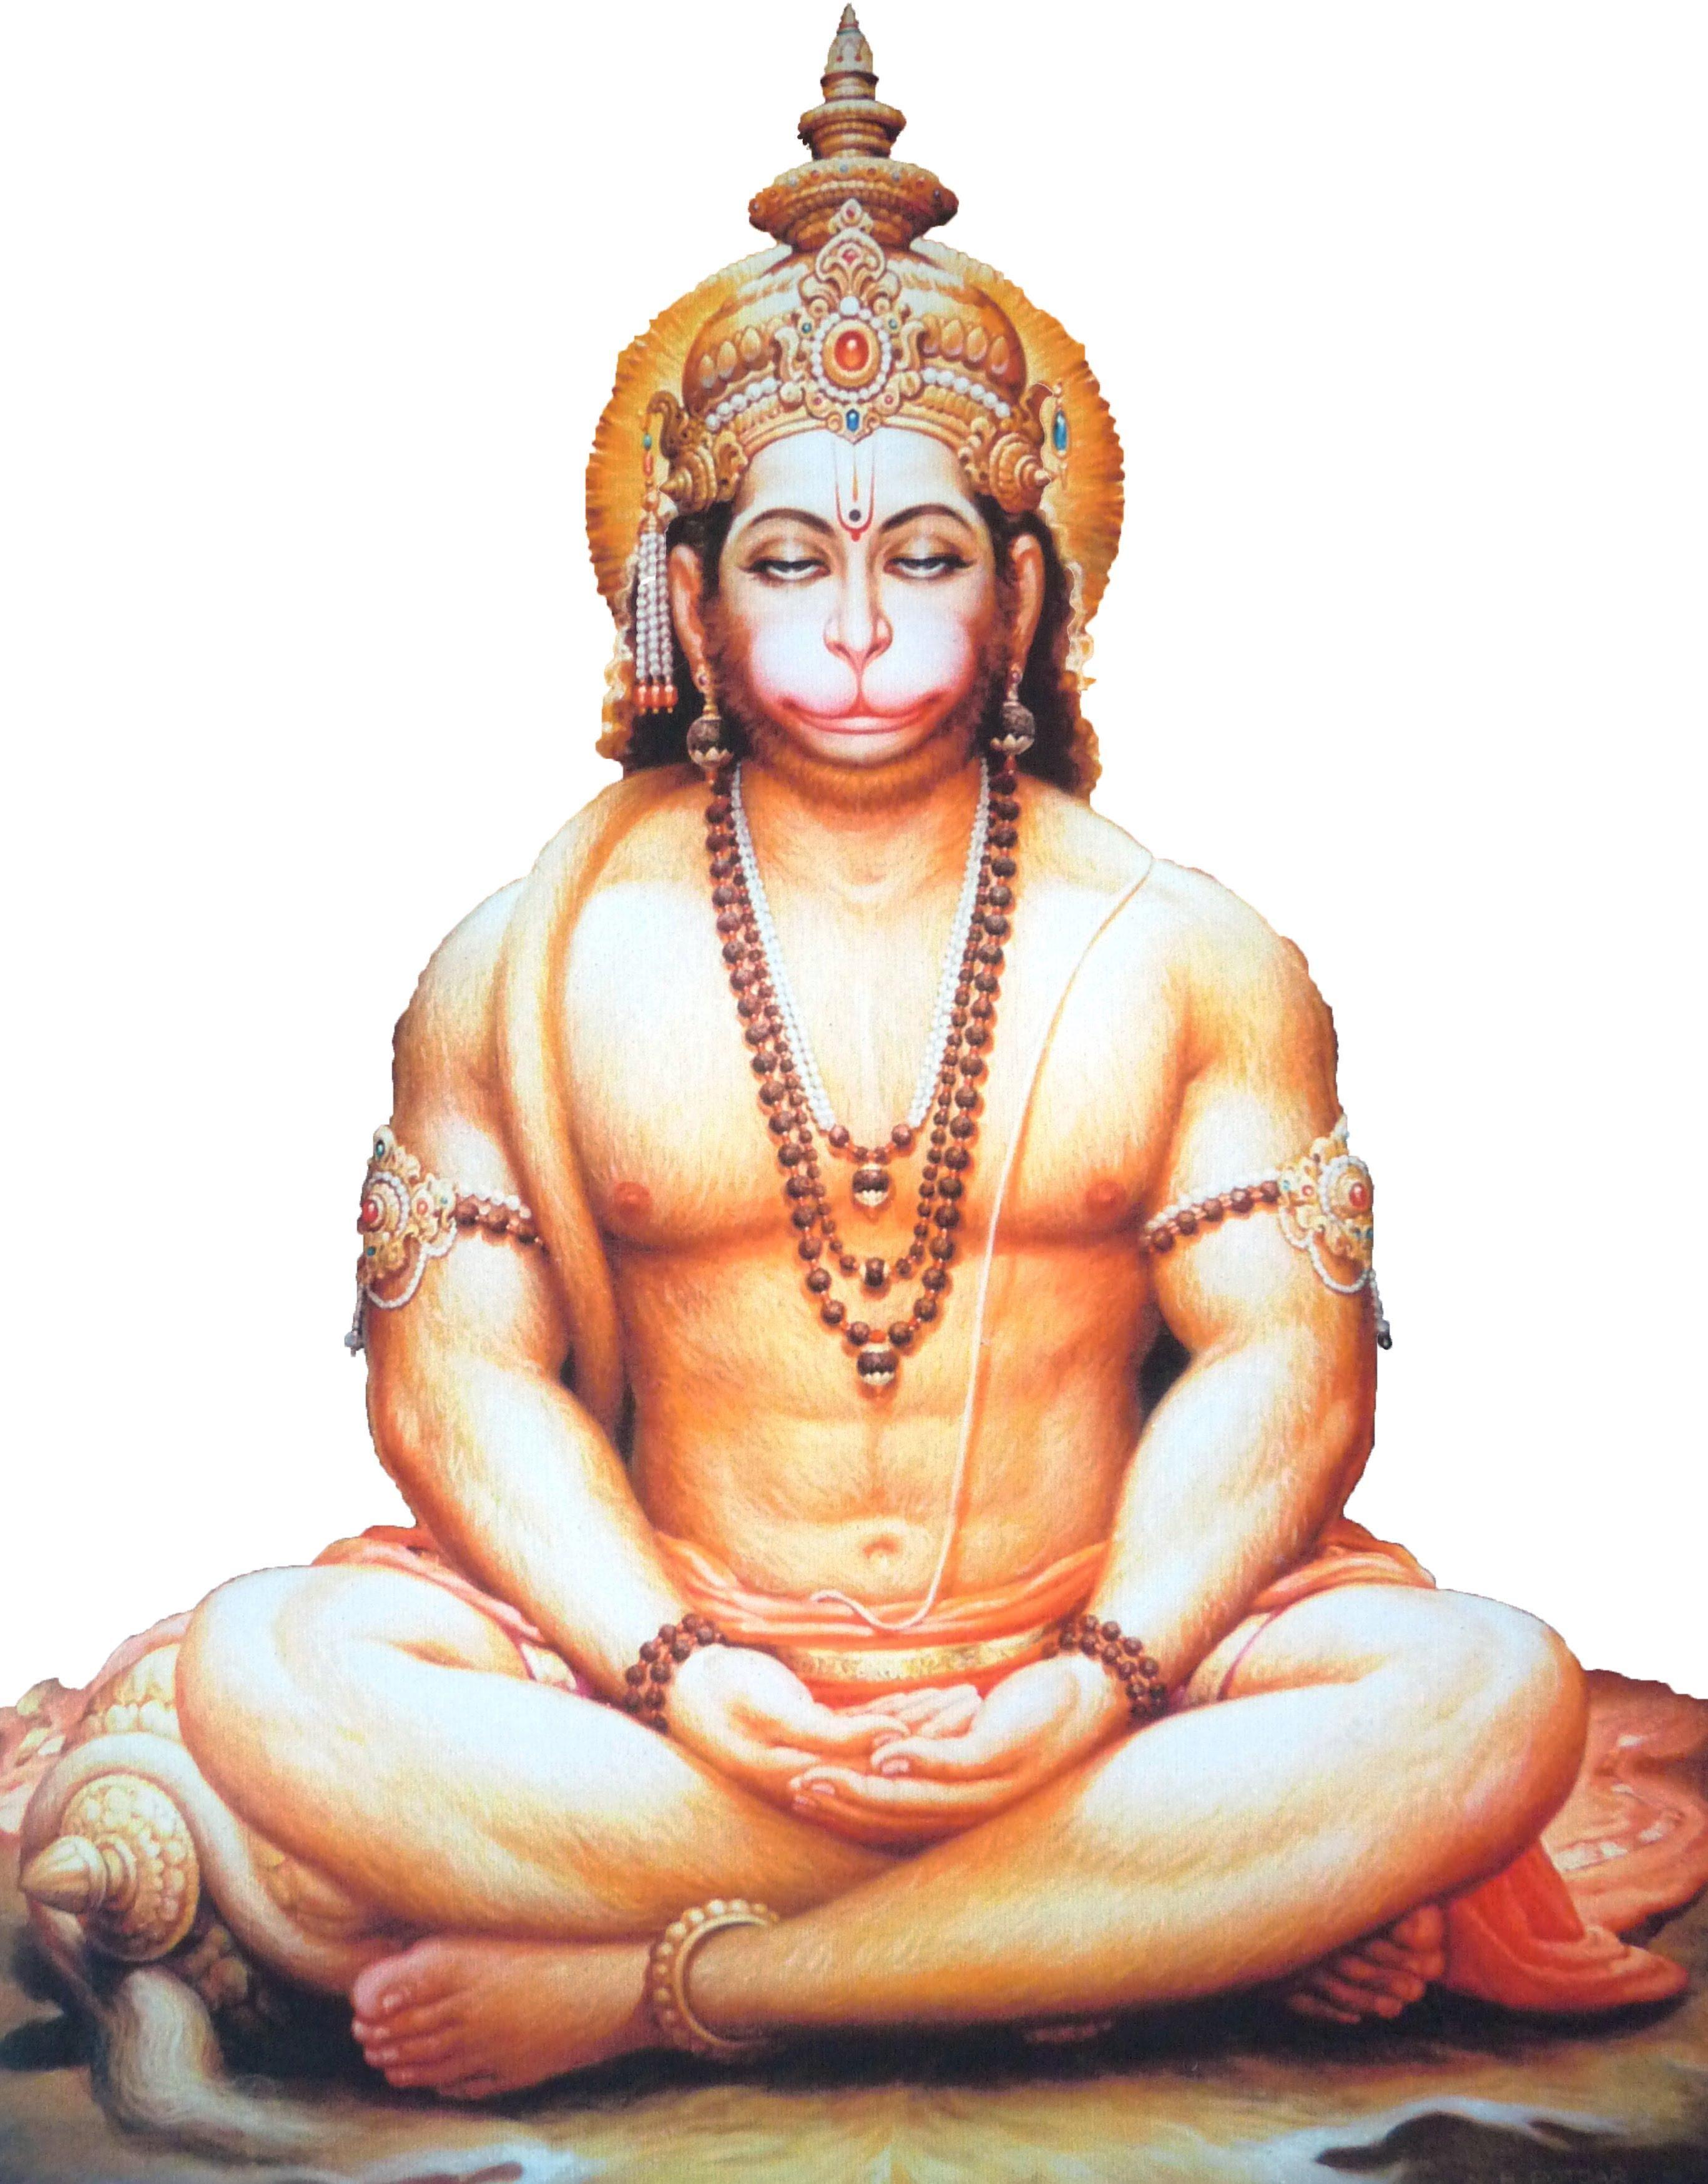 God Hanuman Wallpaper Group 62 Download For Free Hanuman Wallpaper Hanuman Hd Wallpaper Hanuman Hanuman hd wallpapers download